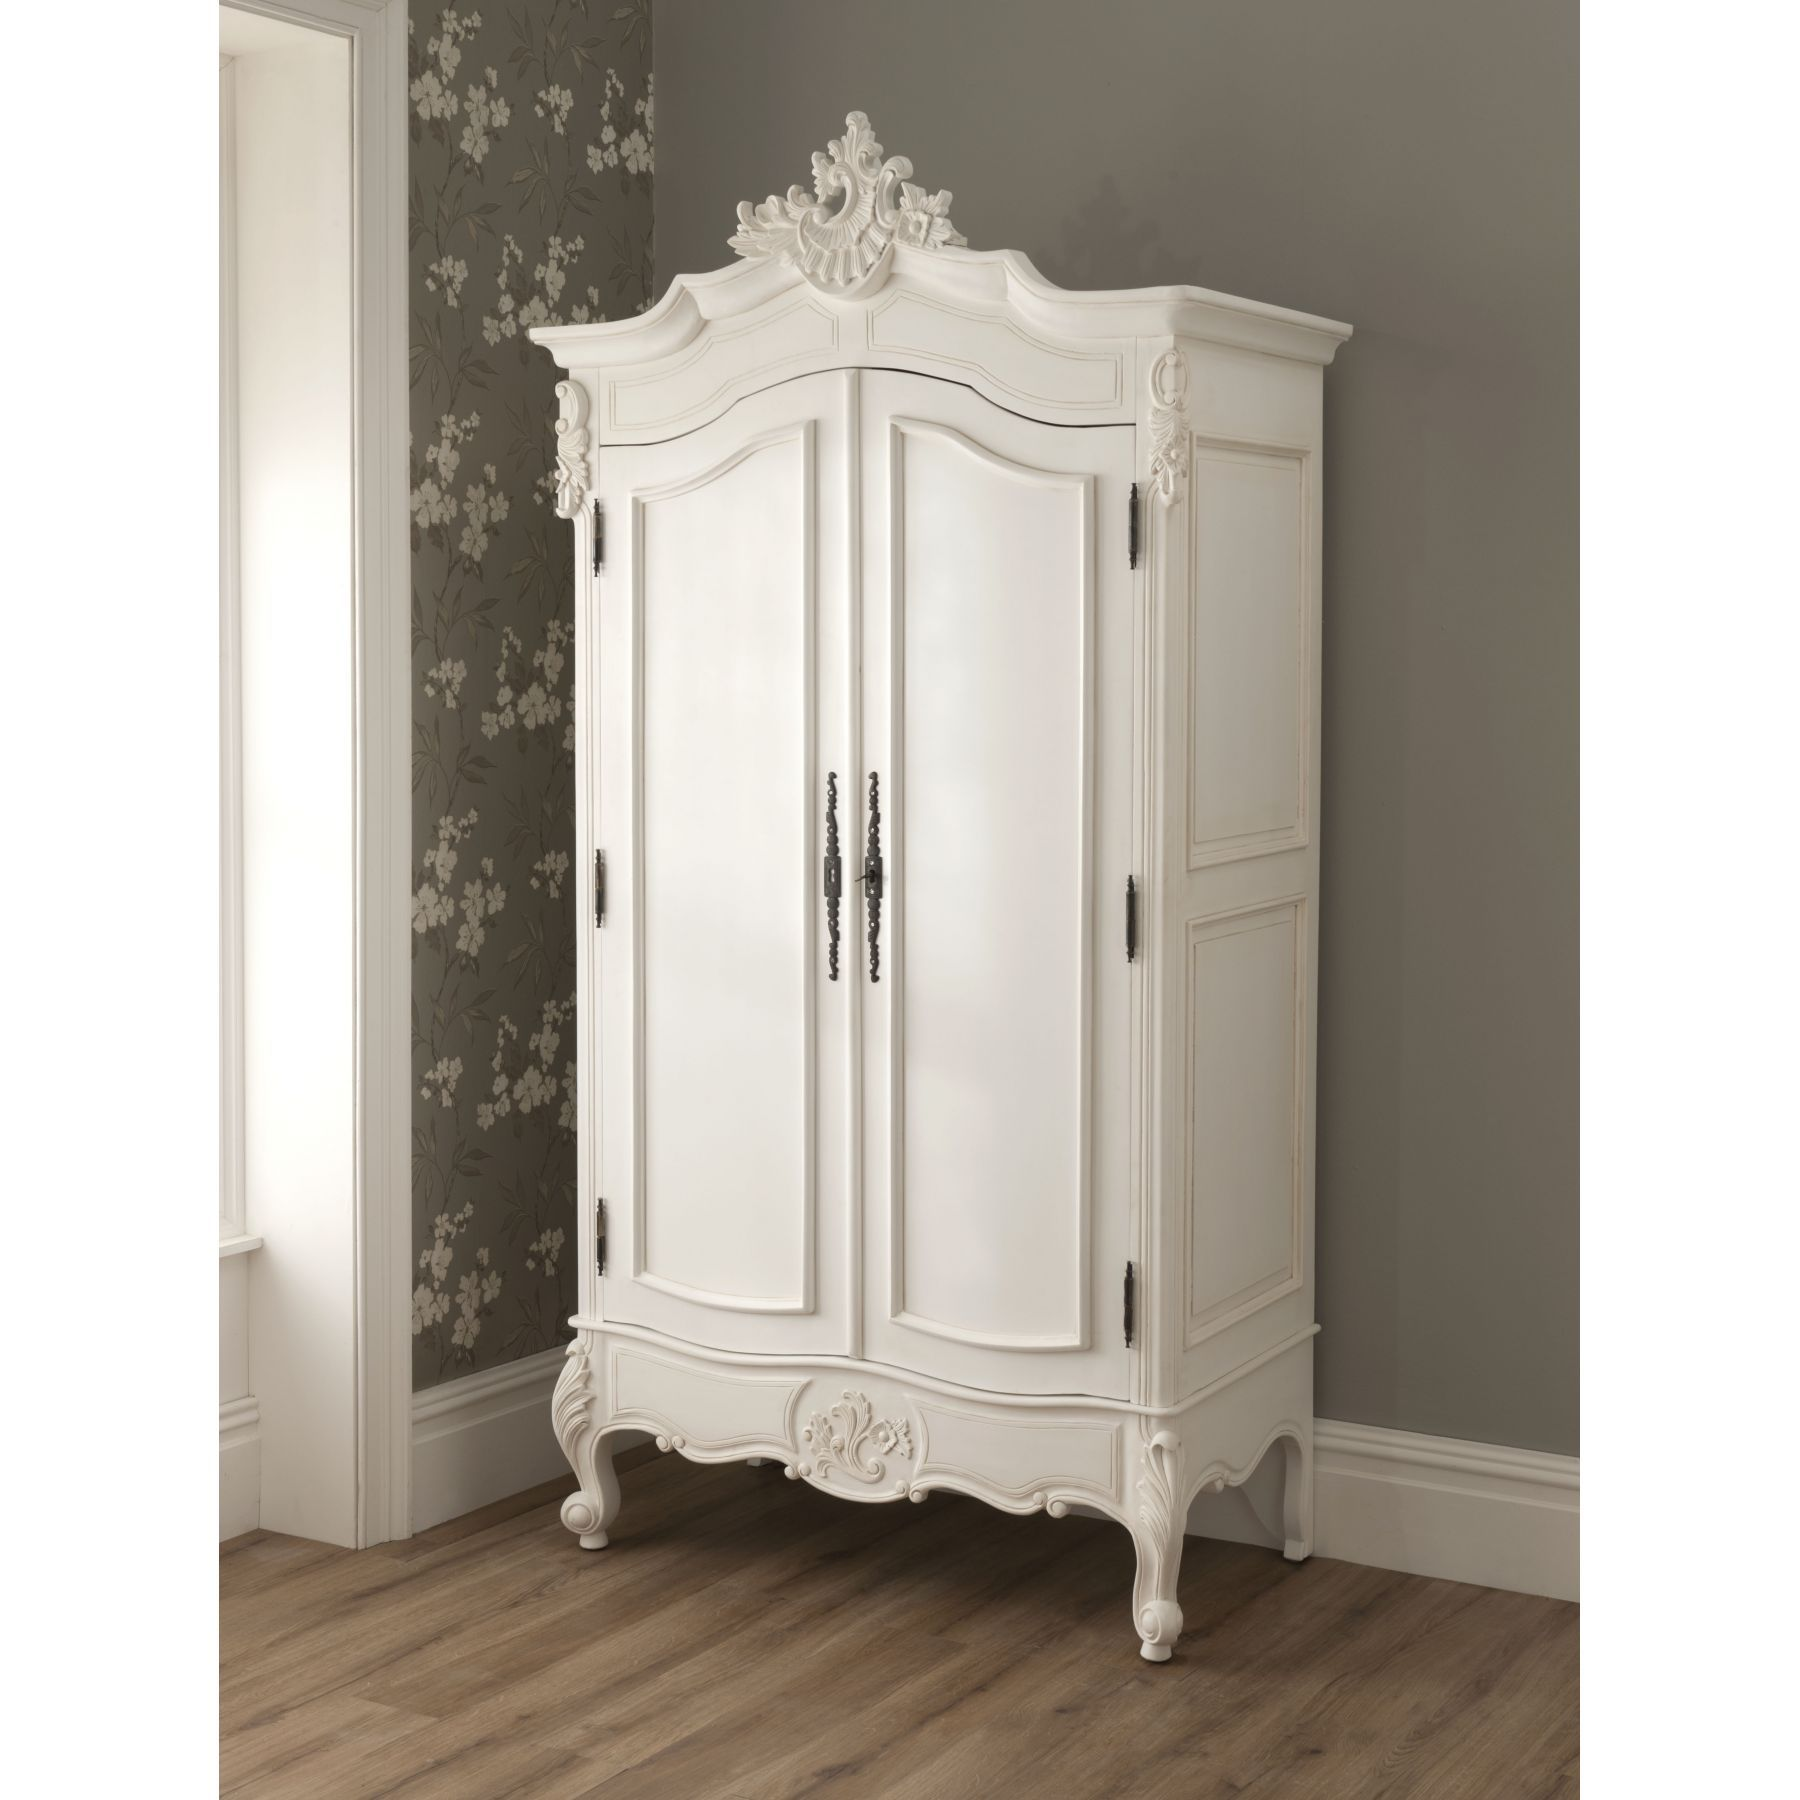 La Rochelle Antique French Wardrobe | Restored Old Furniture ...